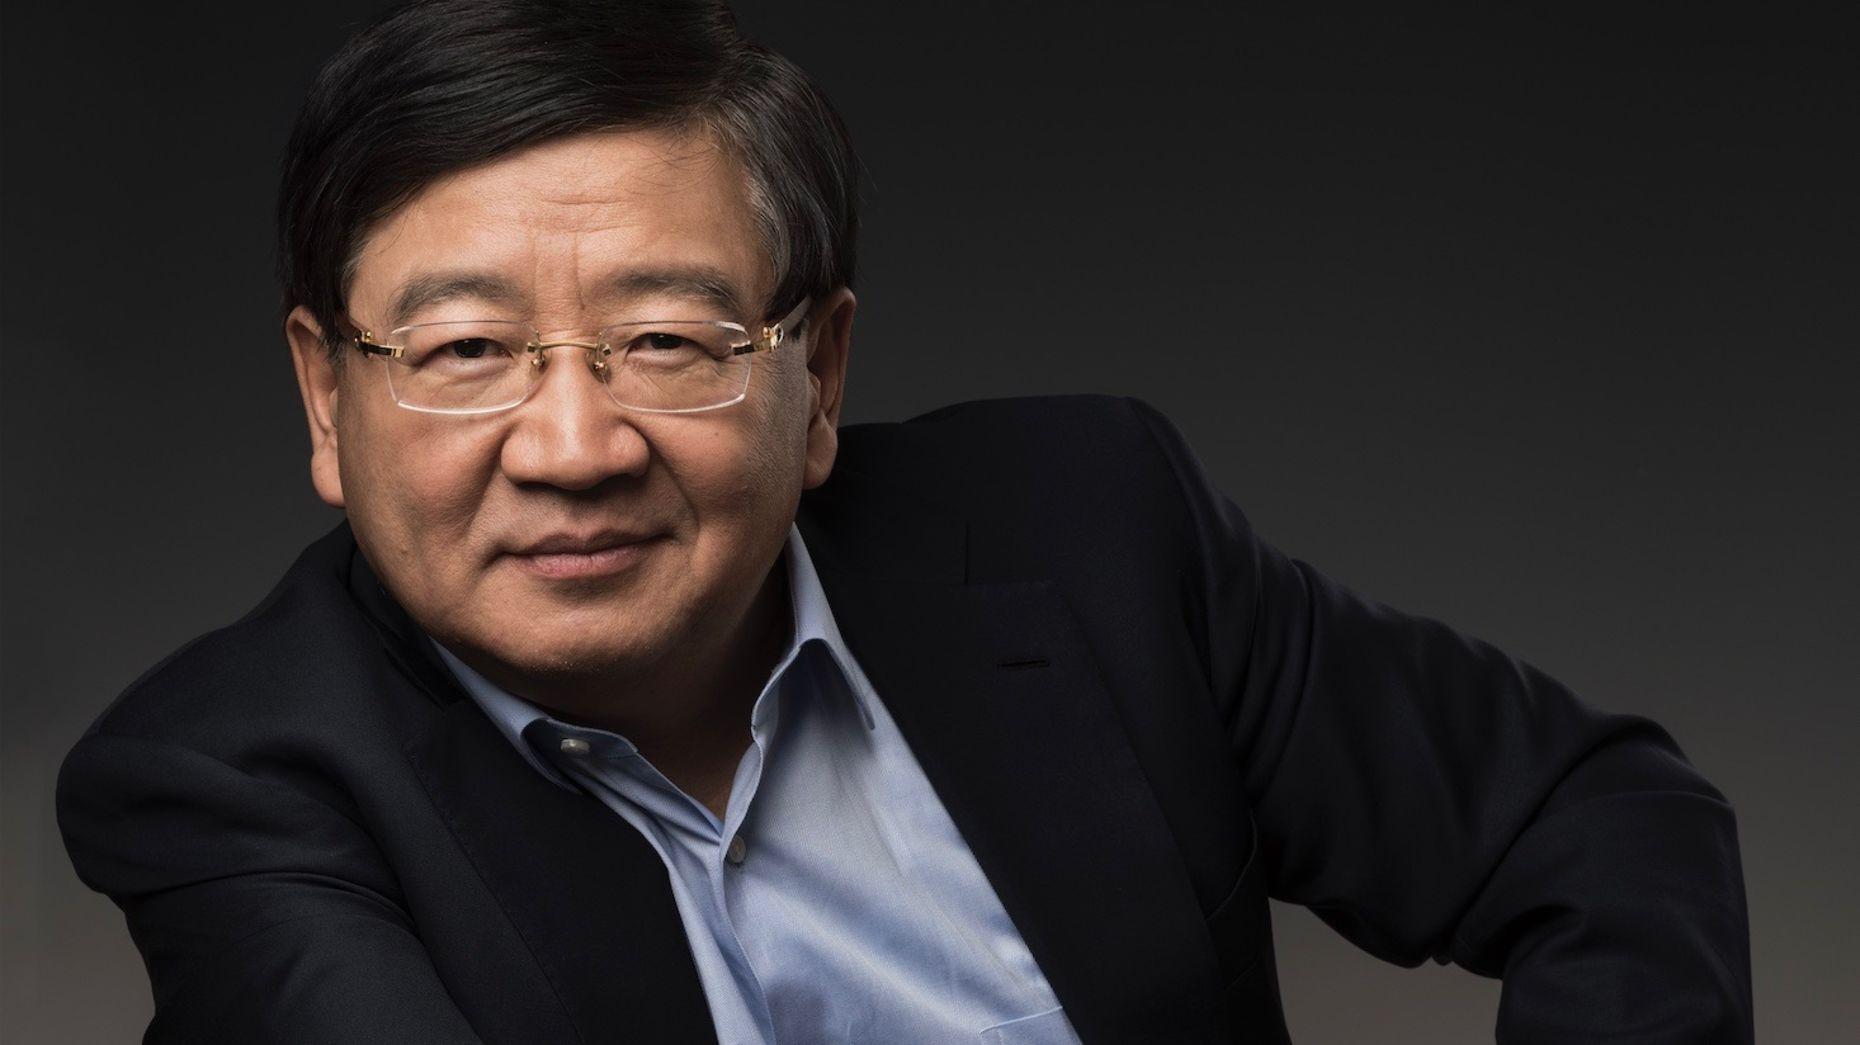 Bob Xu Xiaoping of ZhenFund. Photo by ZhenFund.